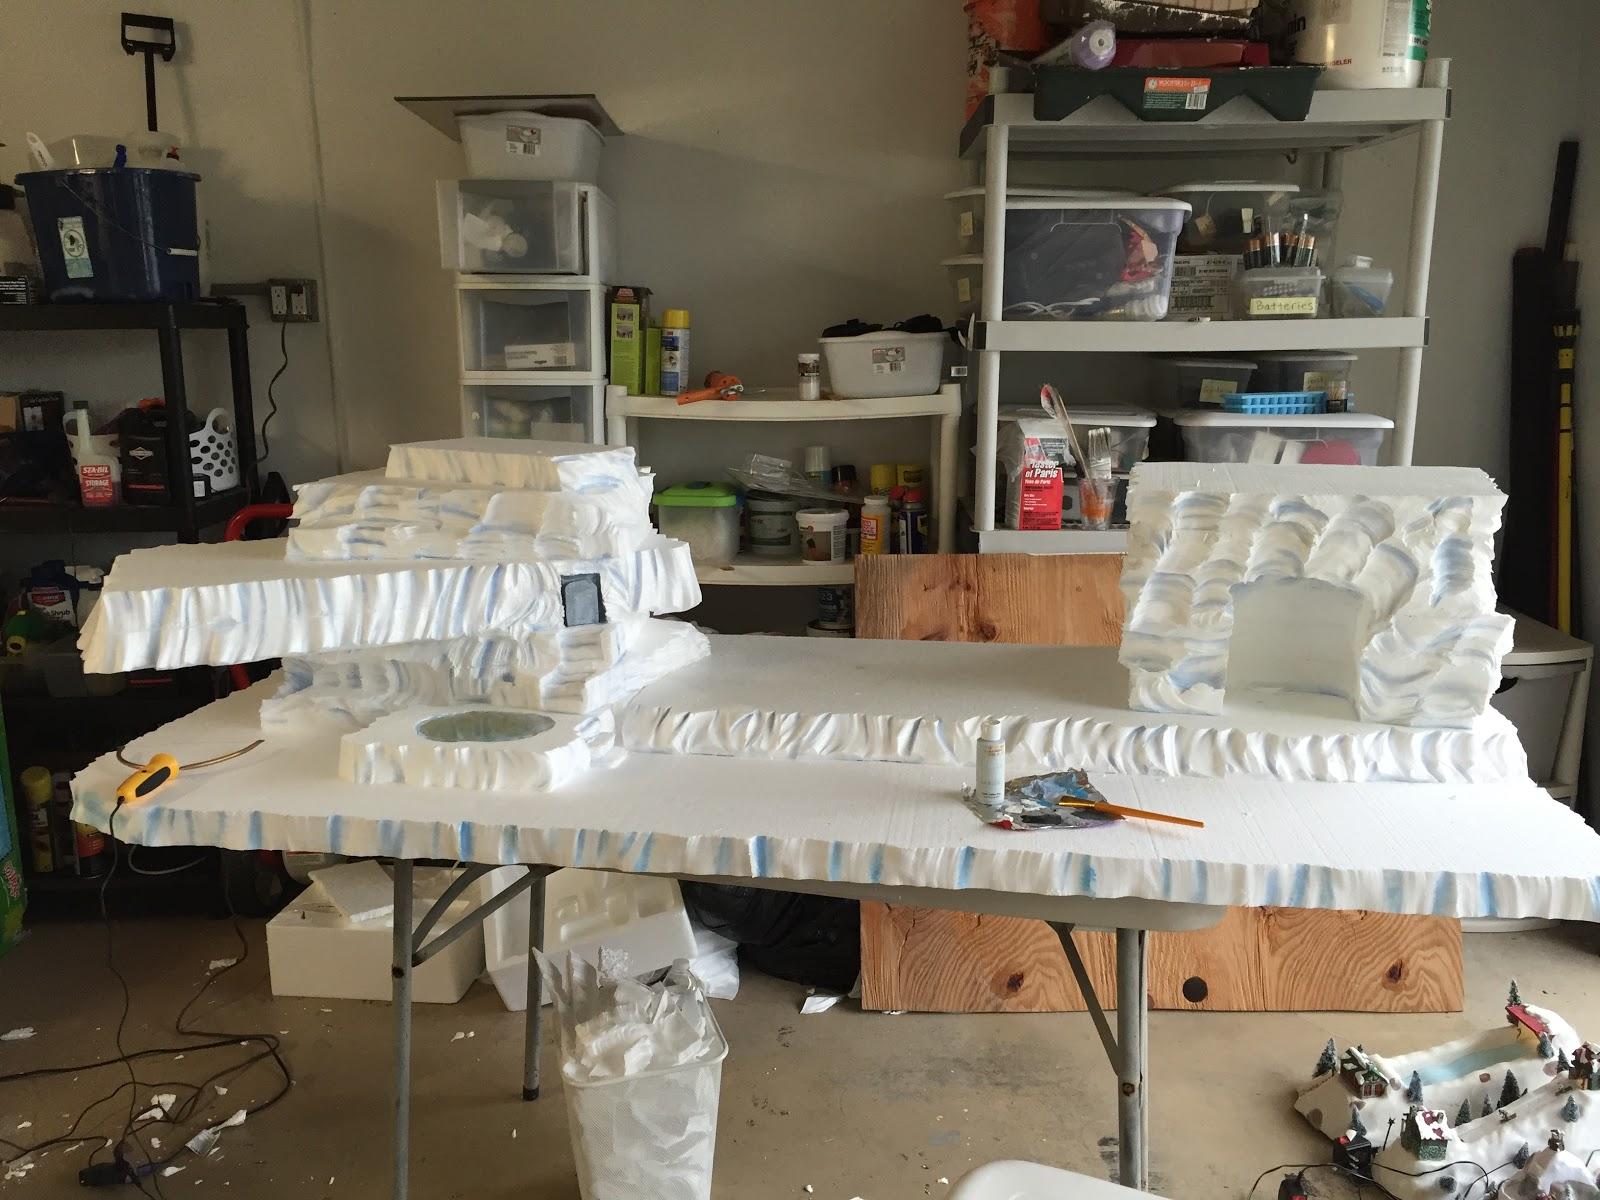 Copeland Christmas Blog: Making a mini Christmas Village Using ...